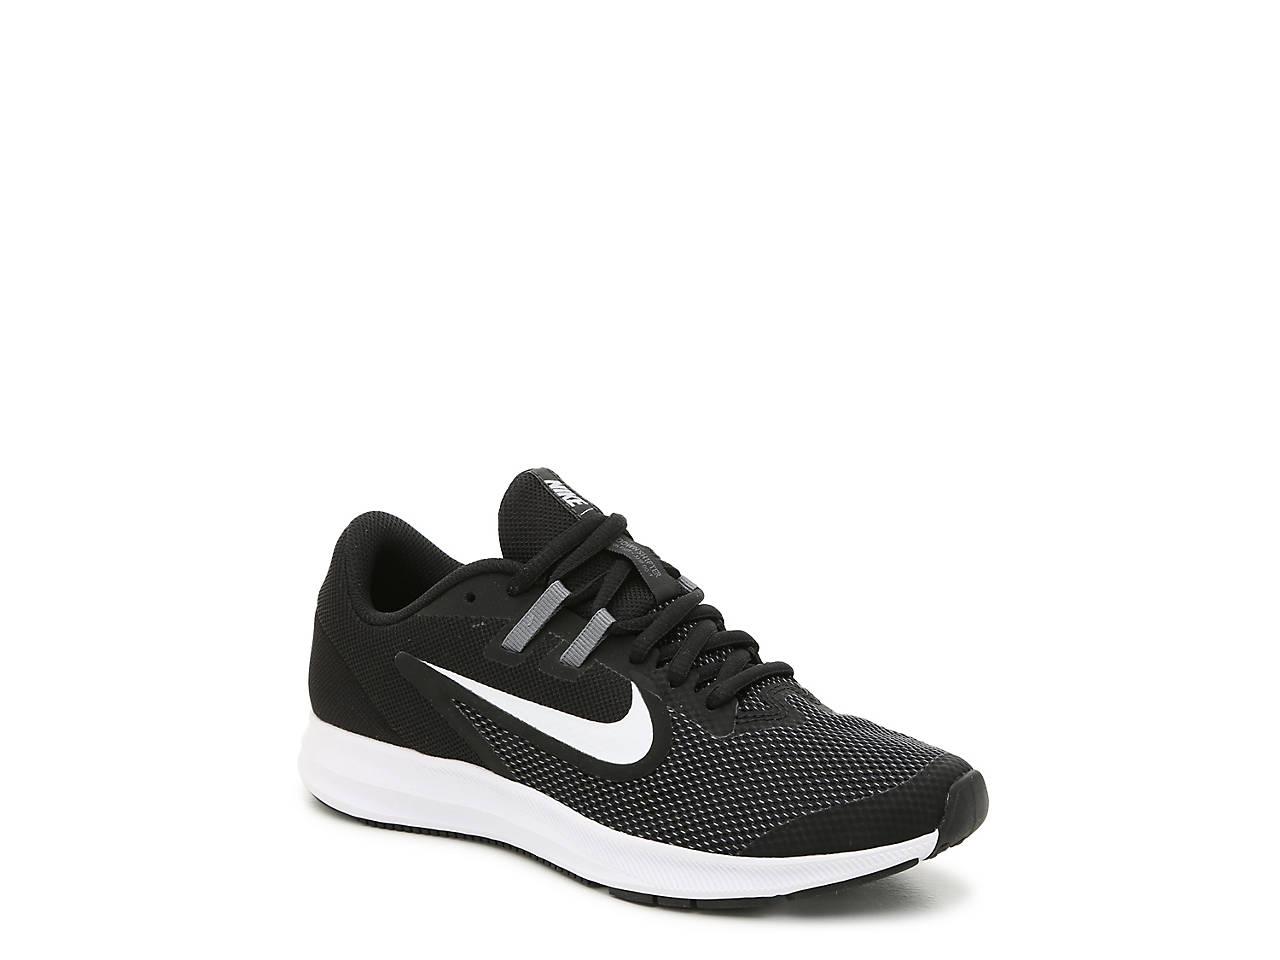 b6d28b7a765d Nike Downshifter 9 Youth Running Shoe Kids Shoes